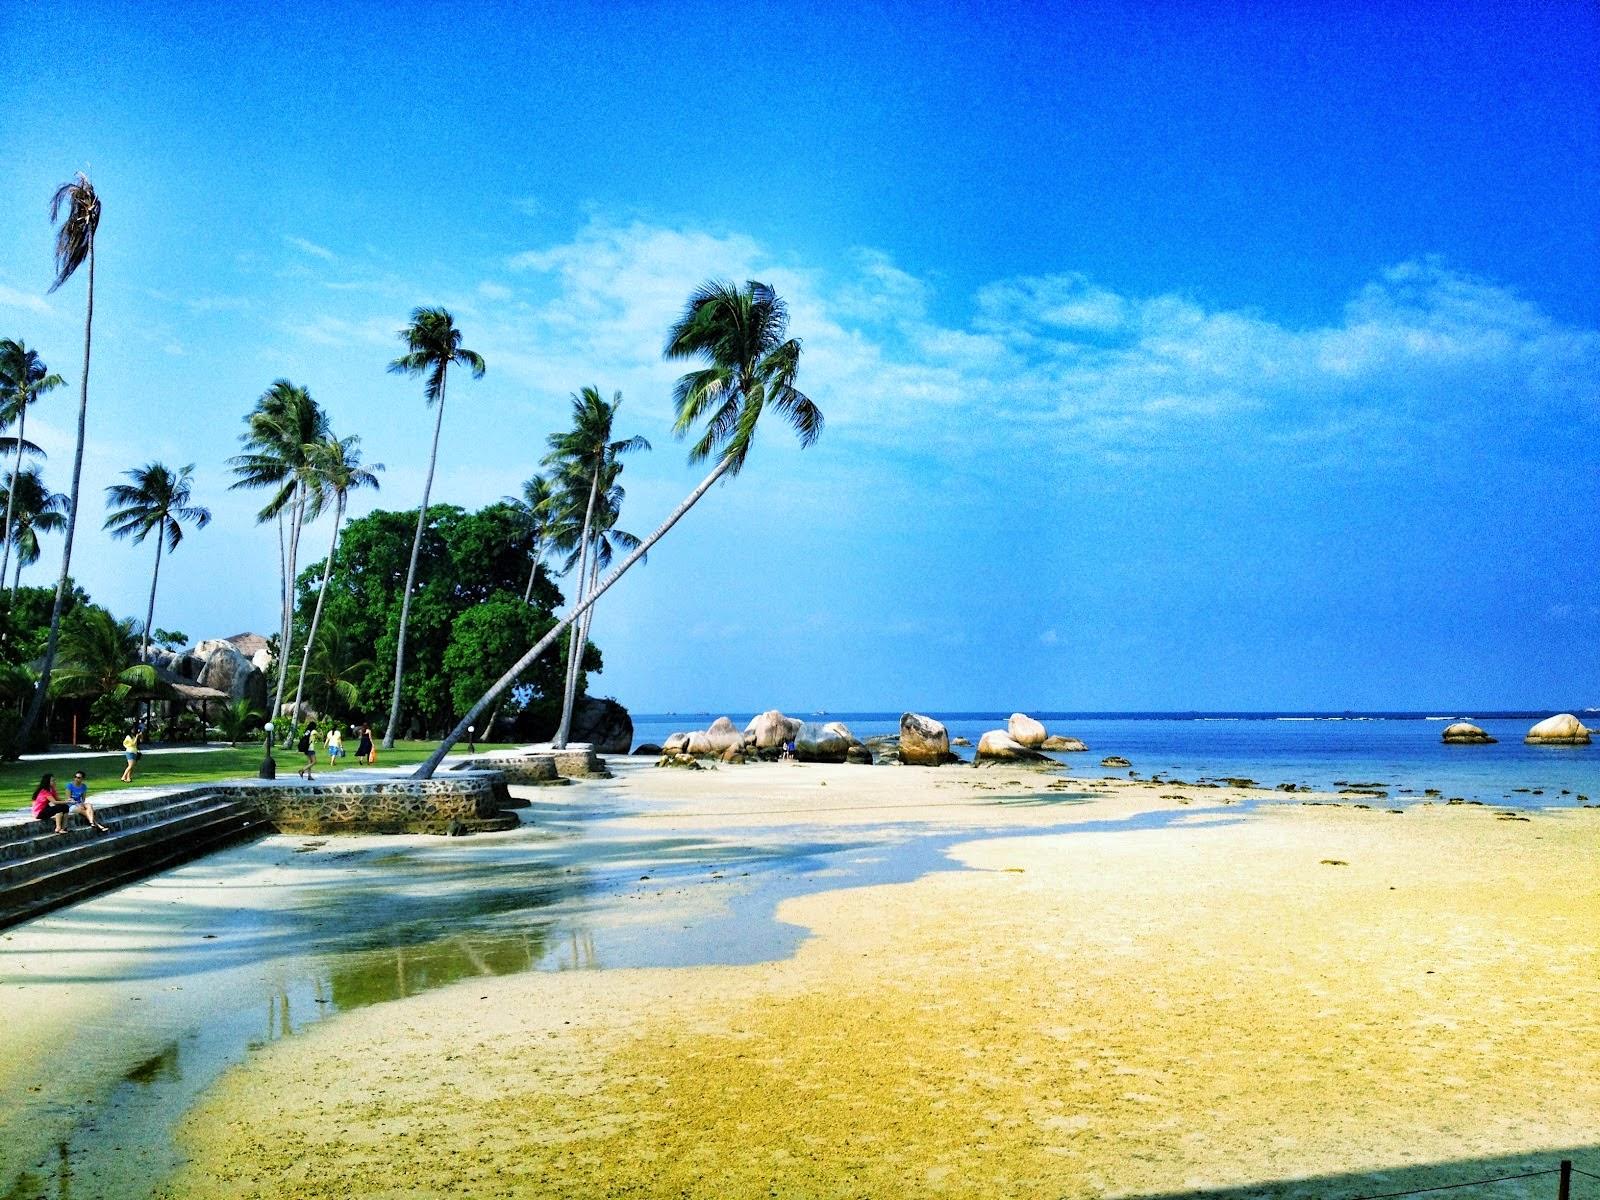 Playa de Trikora en la isla de Bintan, Indonesia